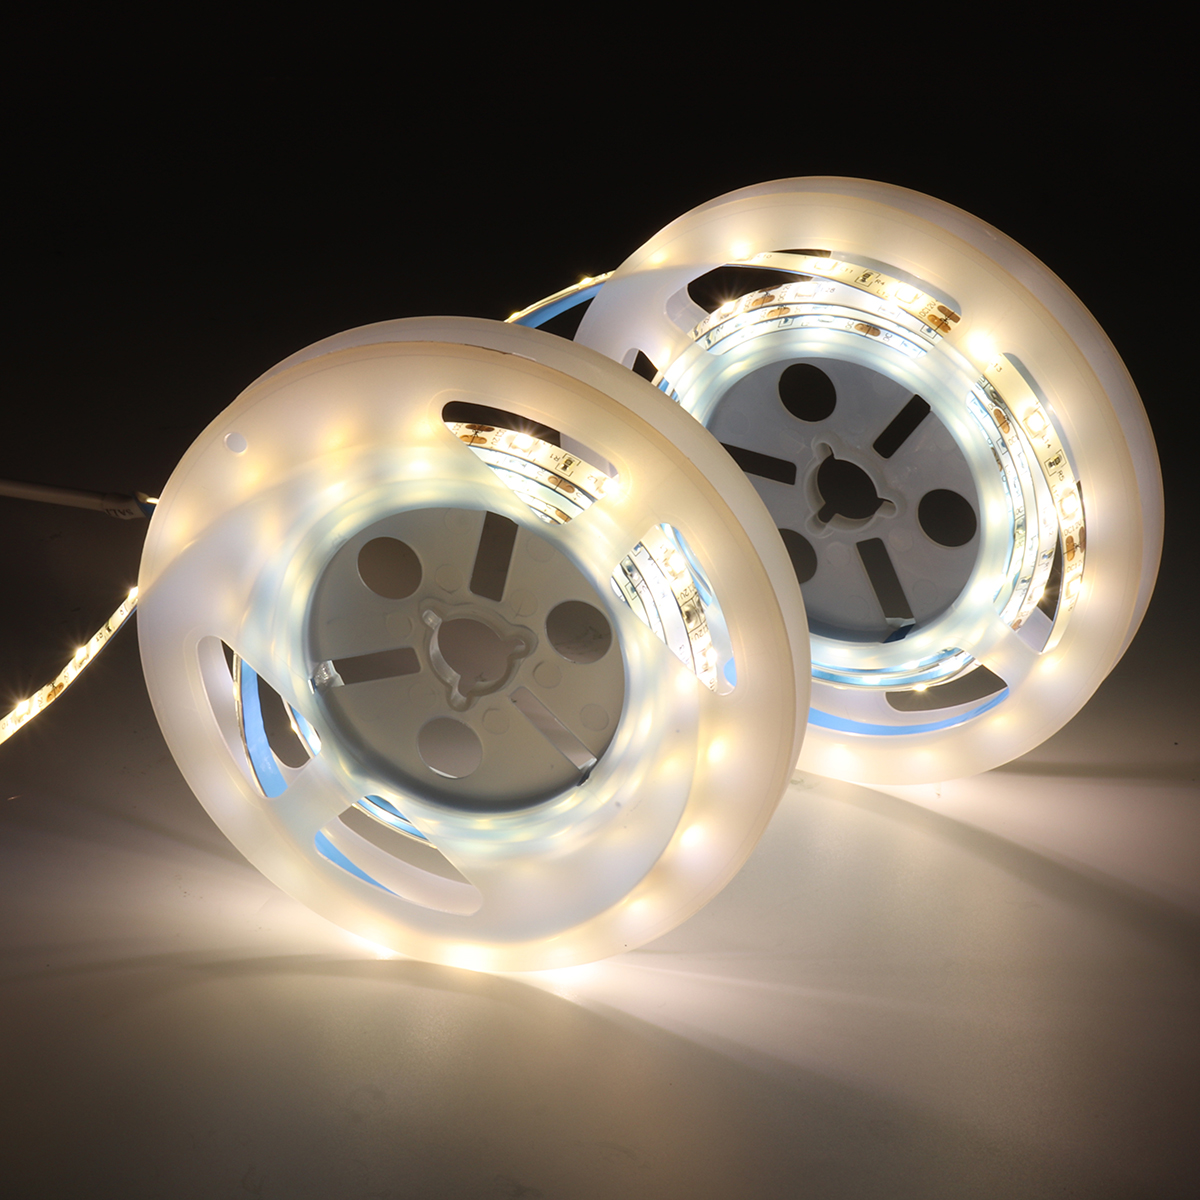 DC 12V Wireless Motion Sensor LED Strip 1.5M 90LED LED Strip with Switch Bed Light Flexiable LED Strip lamp for Cabinet Closet